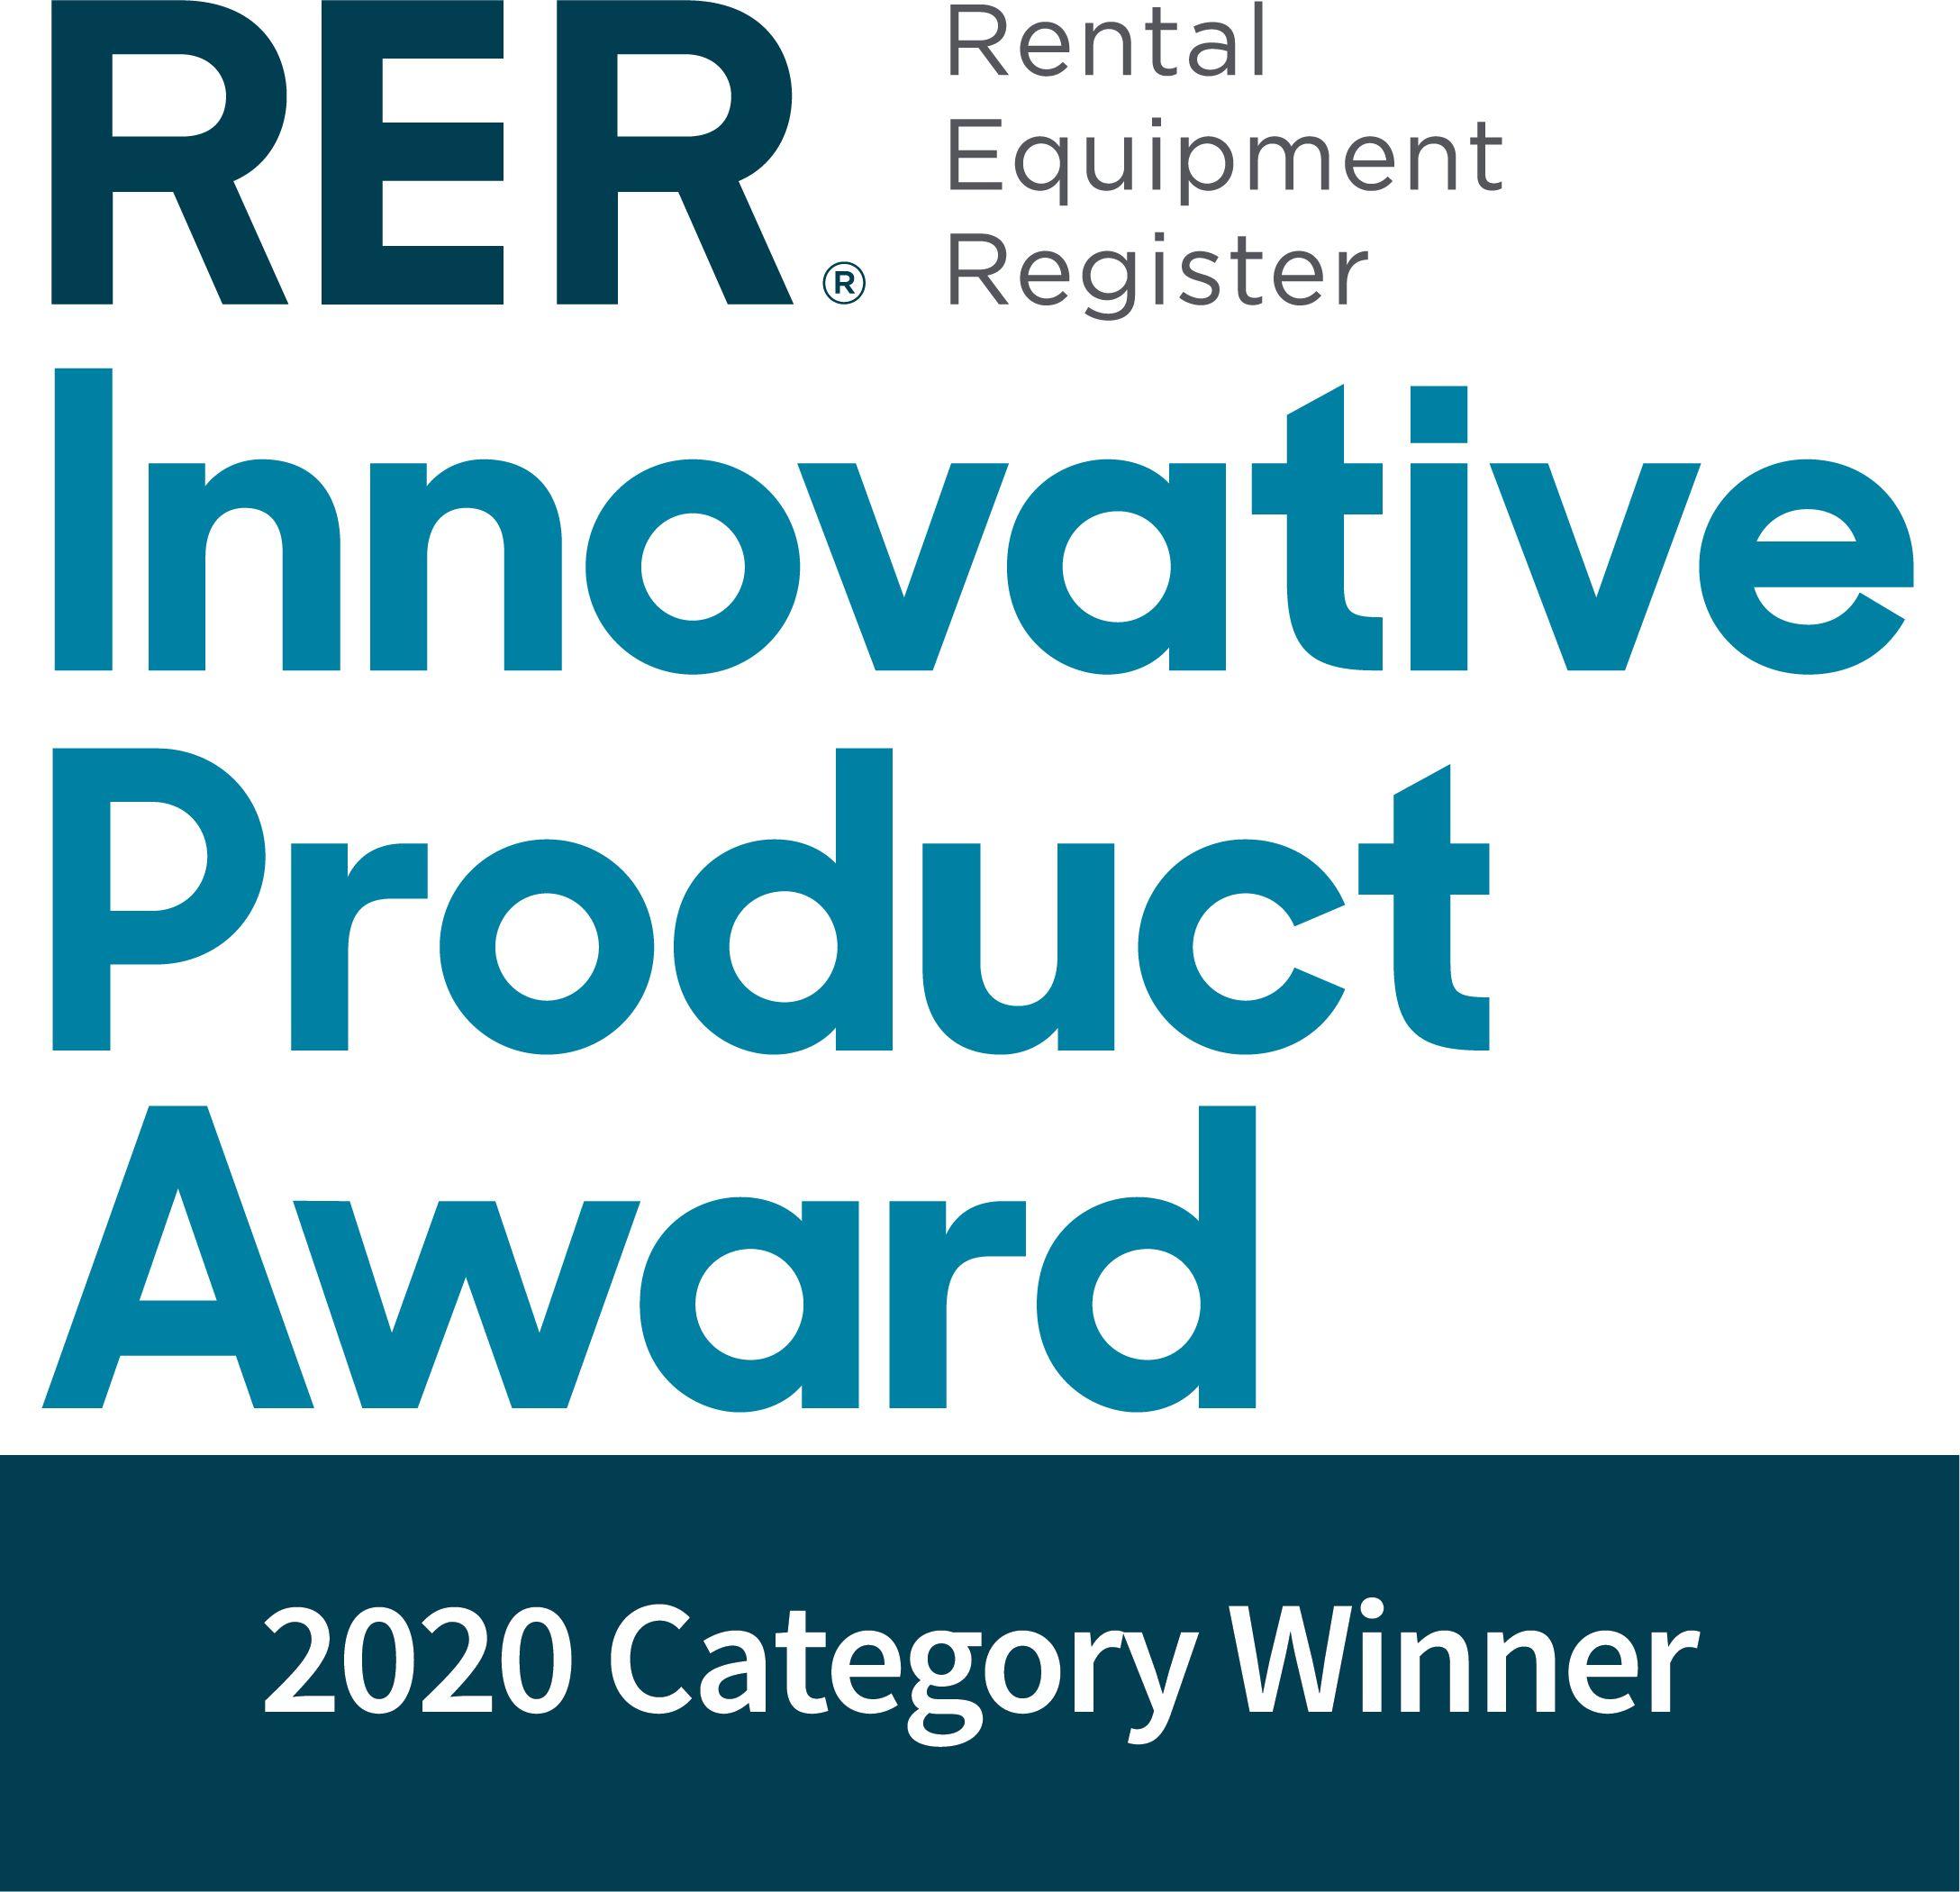 RER - Rental Equipment Register - Innovative Product Award